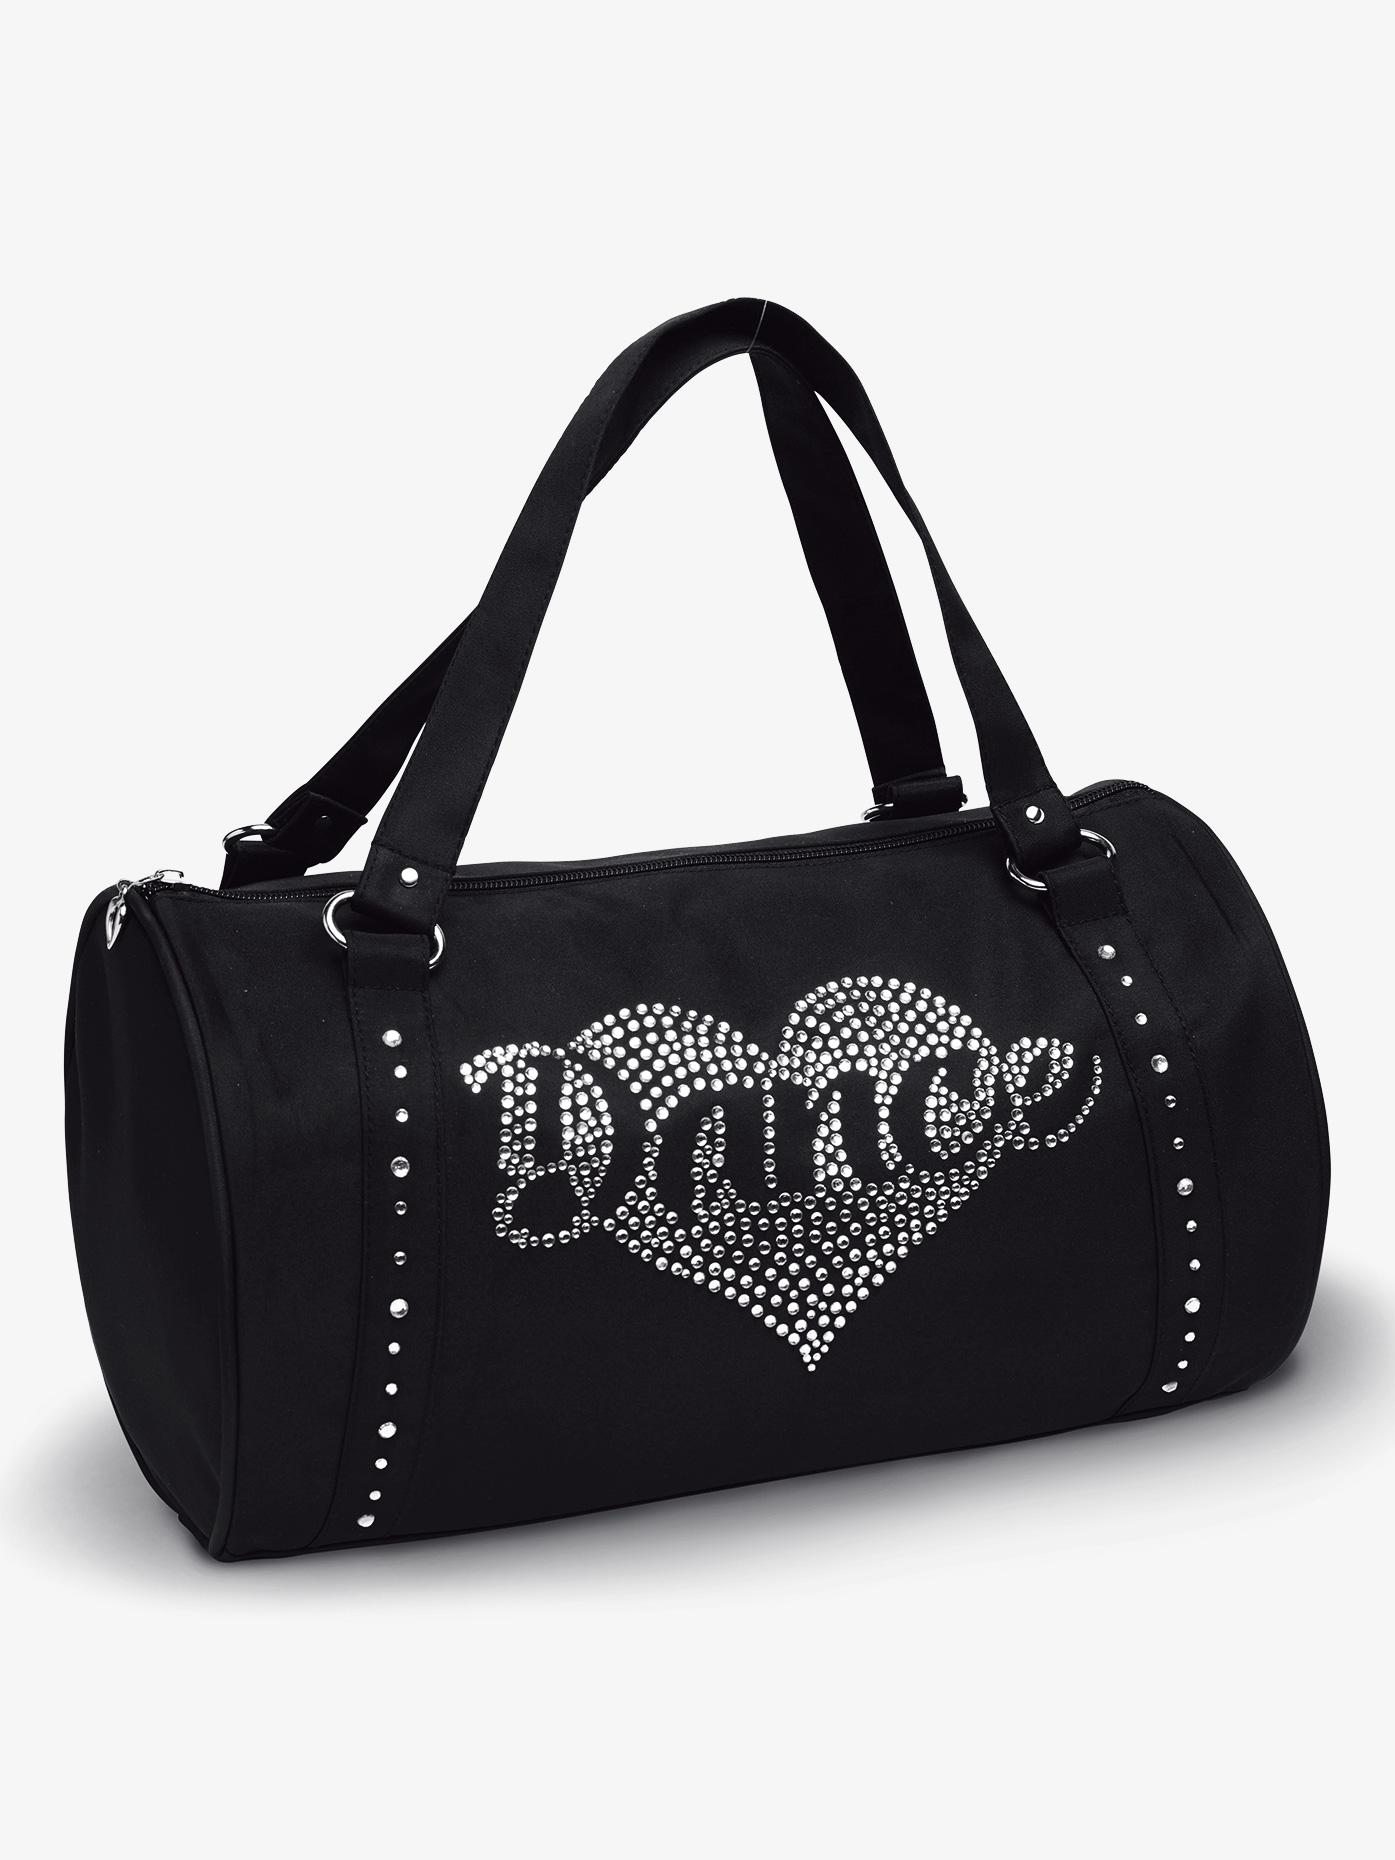 DansBagz Rhinestone Heart Duffle Bag B580